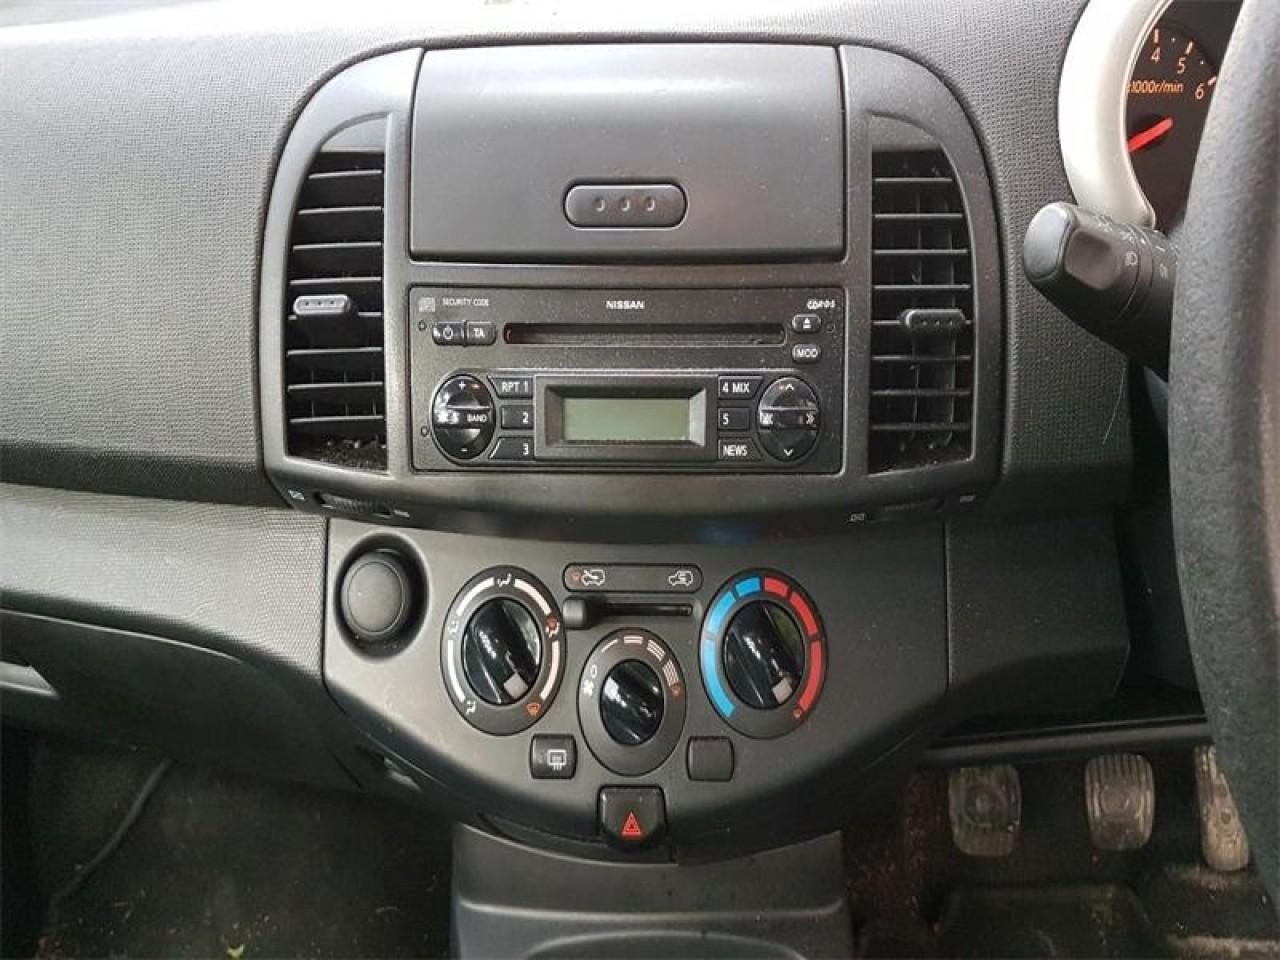 Capac motor protectie Nissan Micra 2009 Hatchback 1.2 i